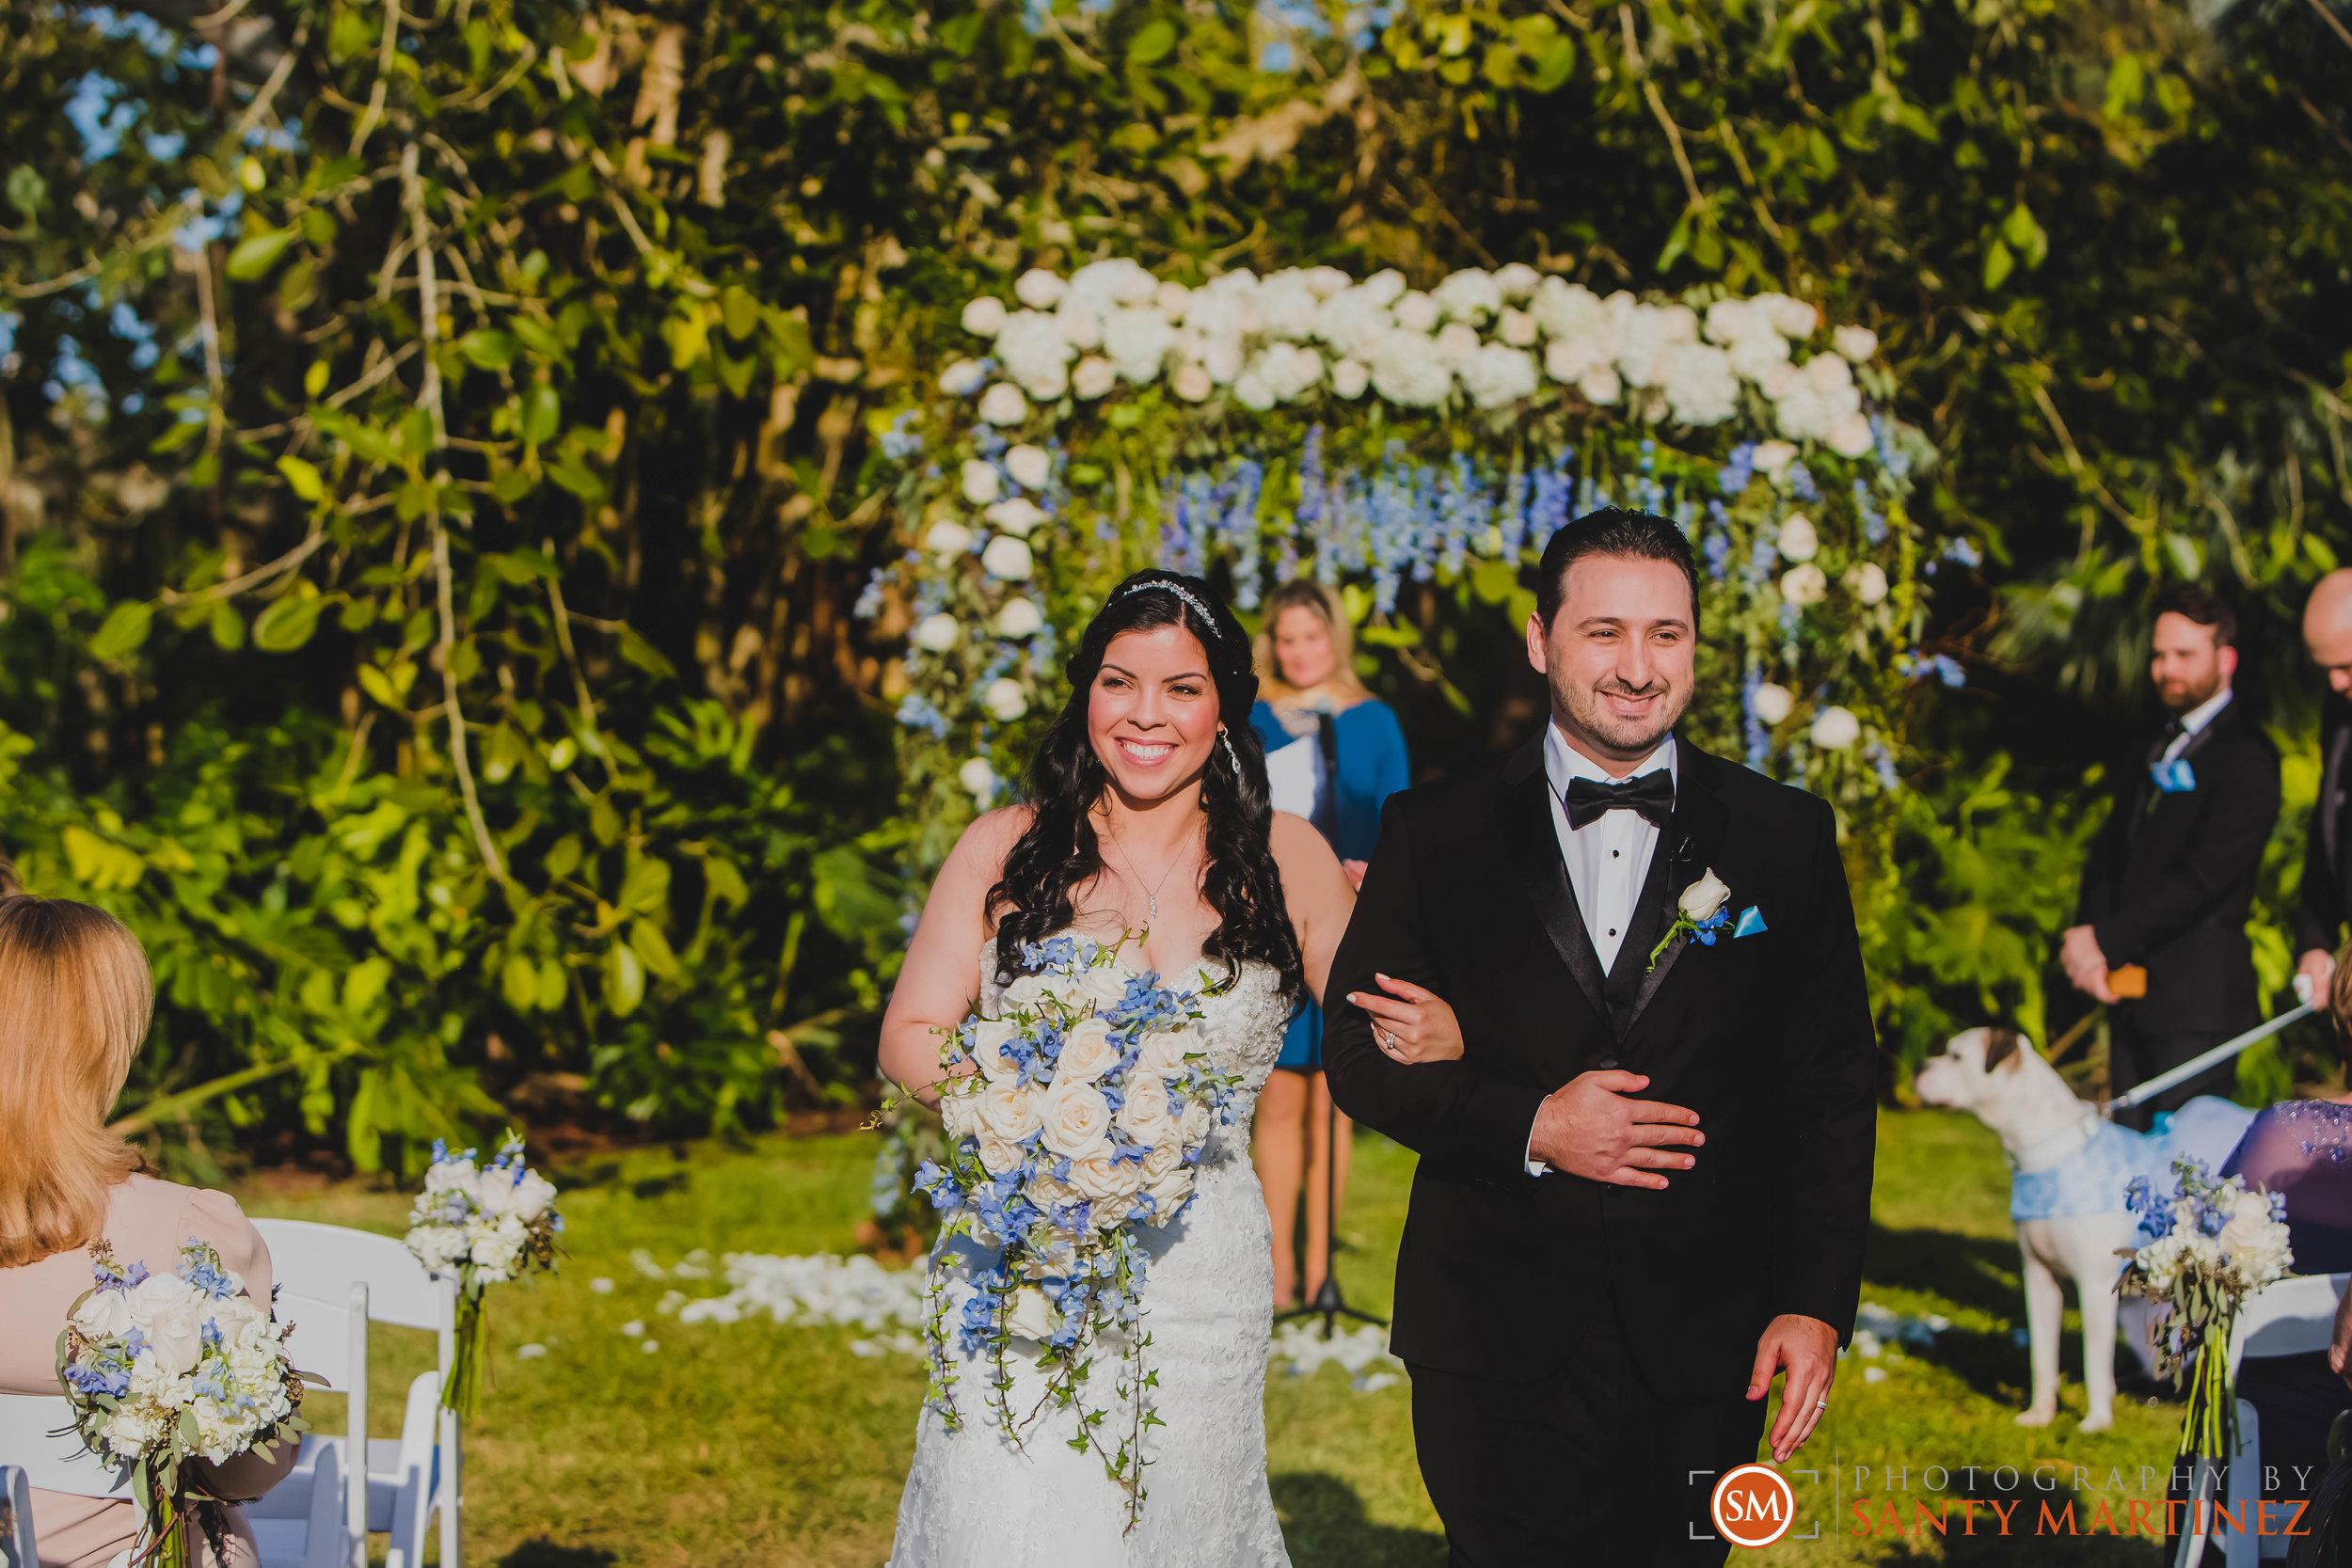 Wedding - Whimsical key West House - Photography by Santy Martinez-22.jpg